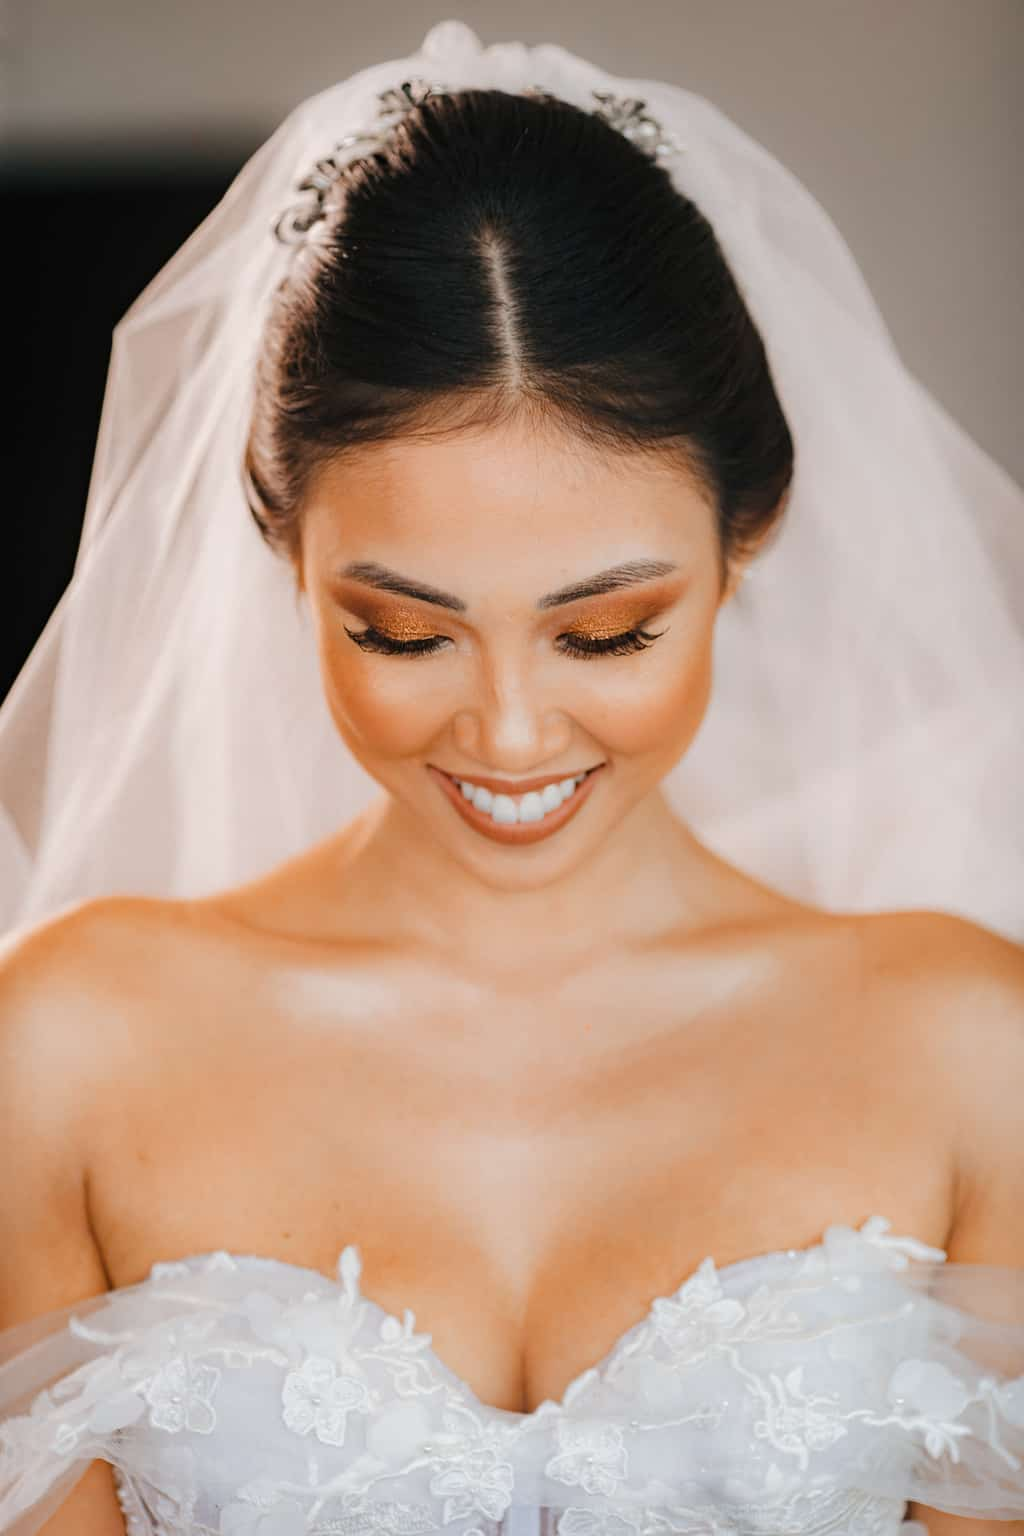 Casamento-Alissa-e-Gustavo-Cerimonial-Manu-Goncalez-Decor-Andrea-Kapps-Fasano-Angra-dos-Reis-Foto-VRebel-G-Junior-Making-of1989-Edit